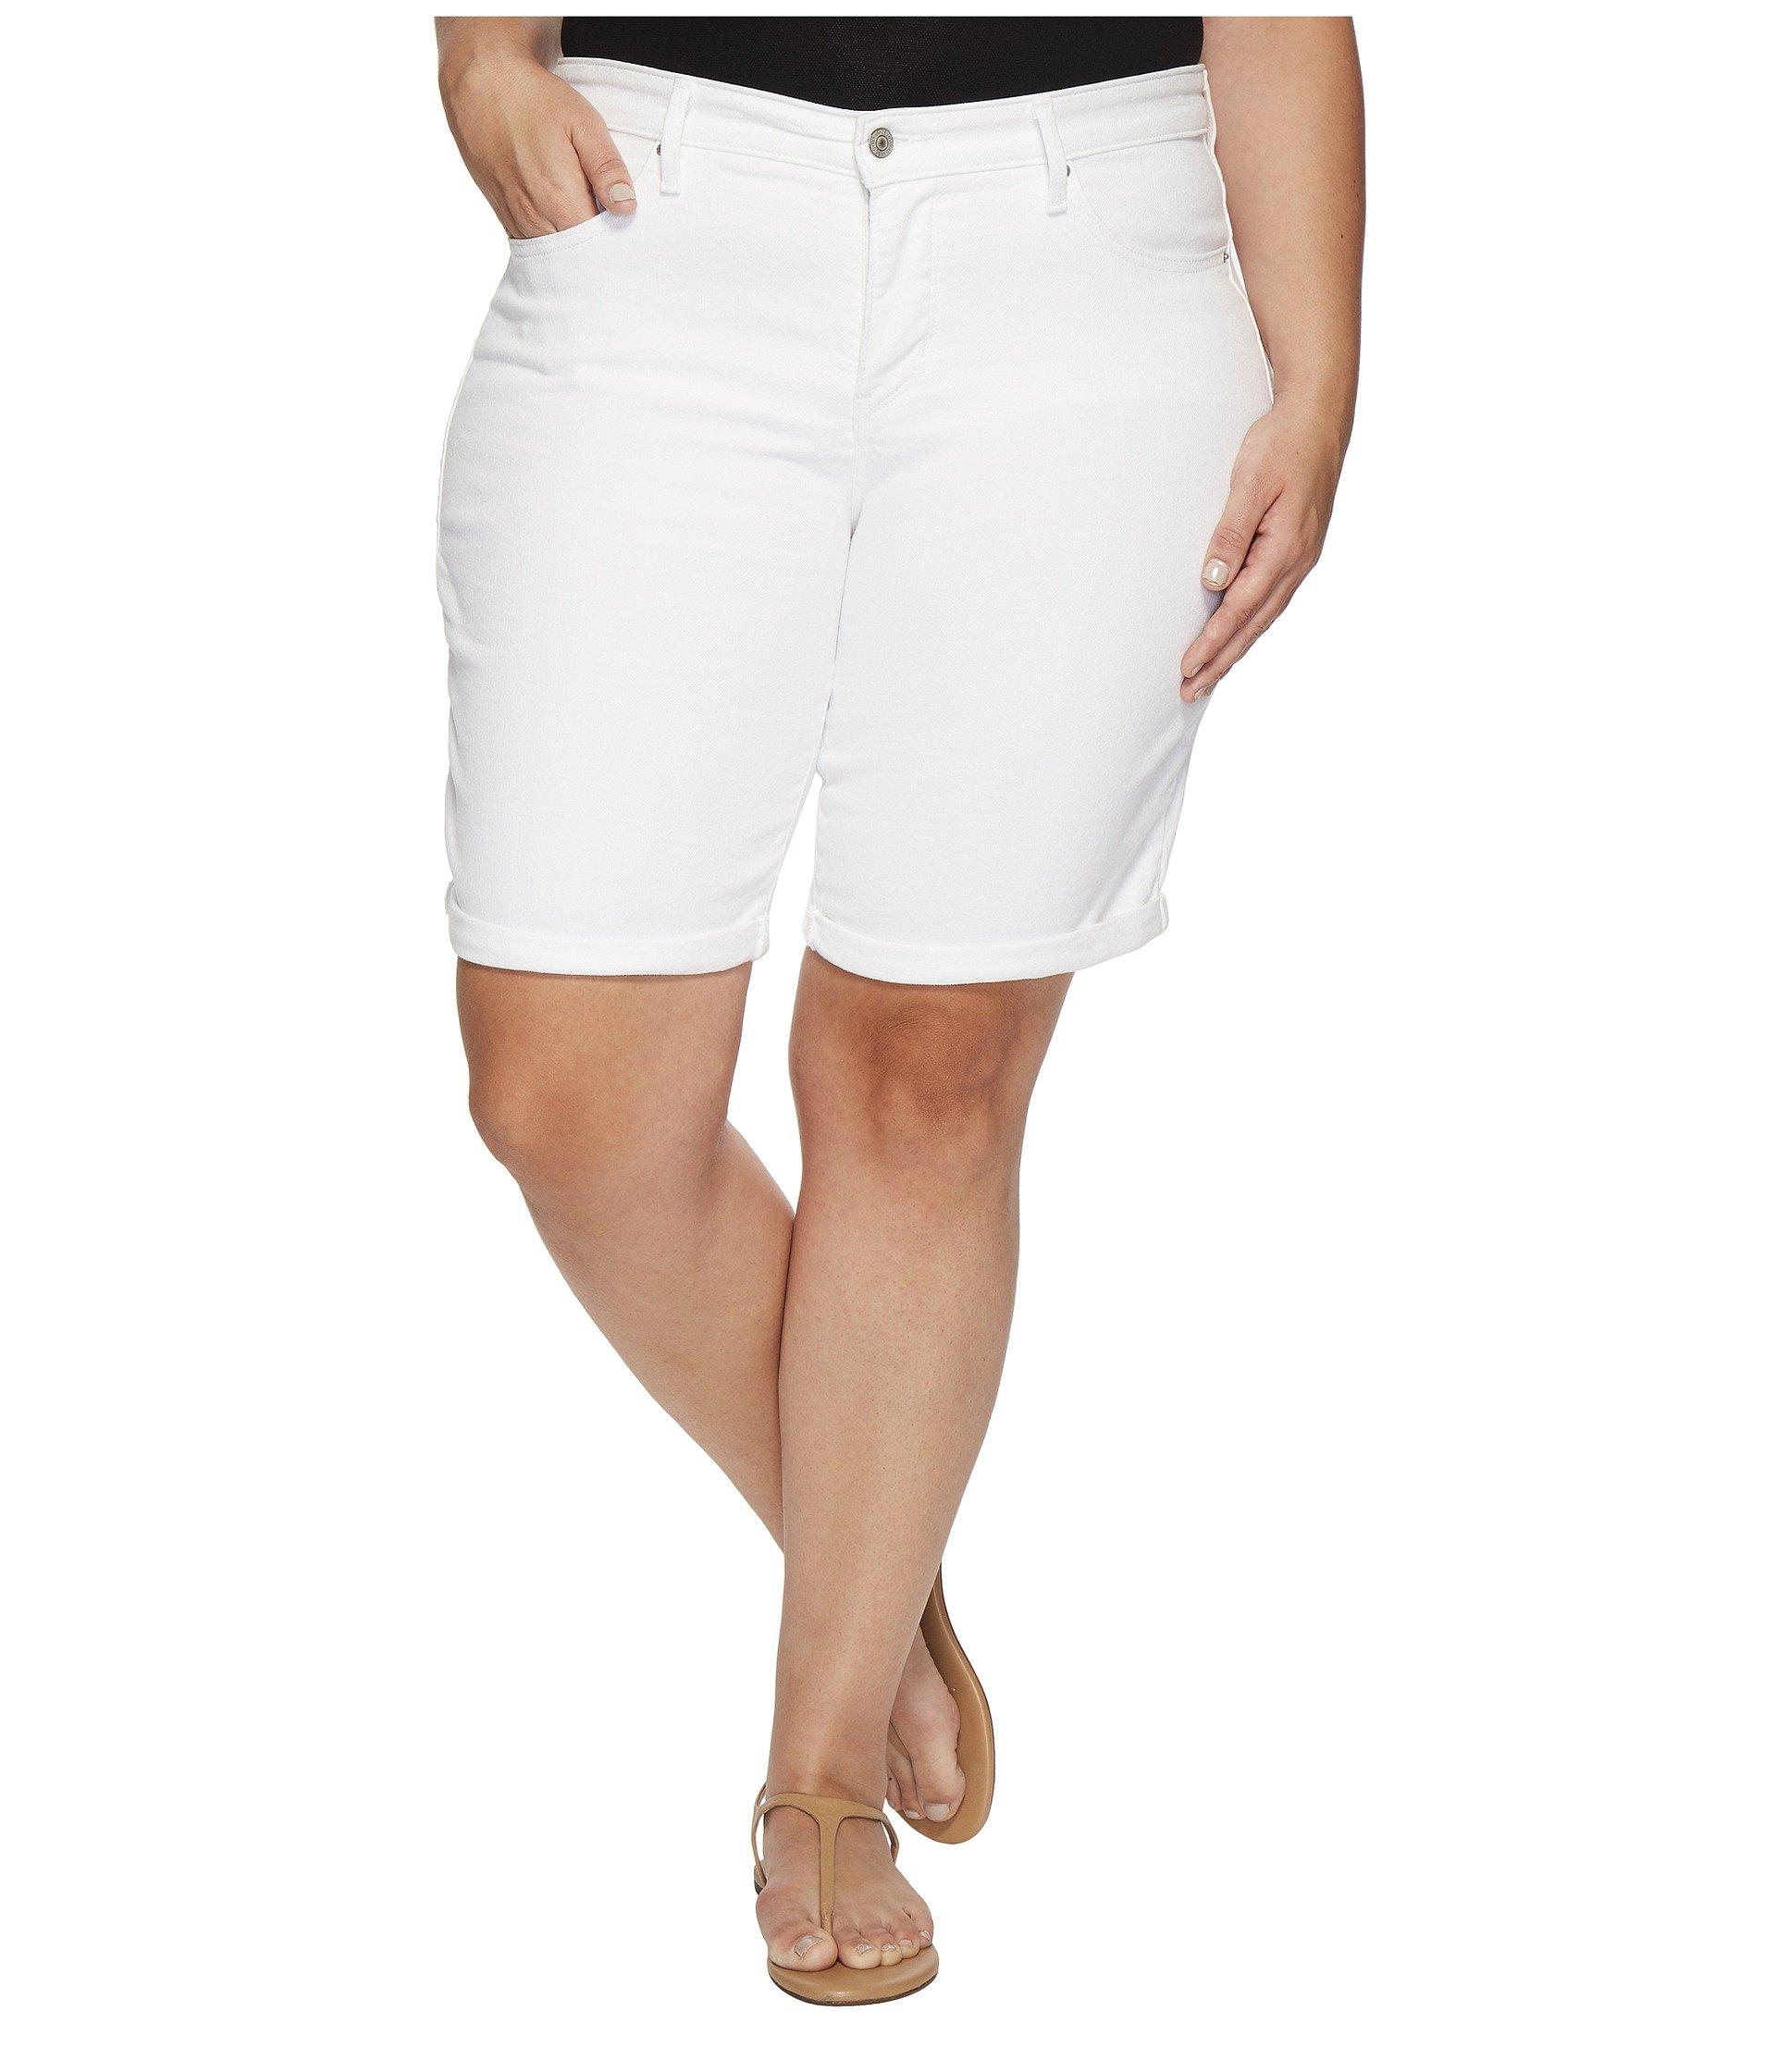 Levi's Women's Plus-Size Shaping Bermuda Shorts, Soft Clean White, 38 (US 18)